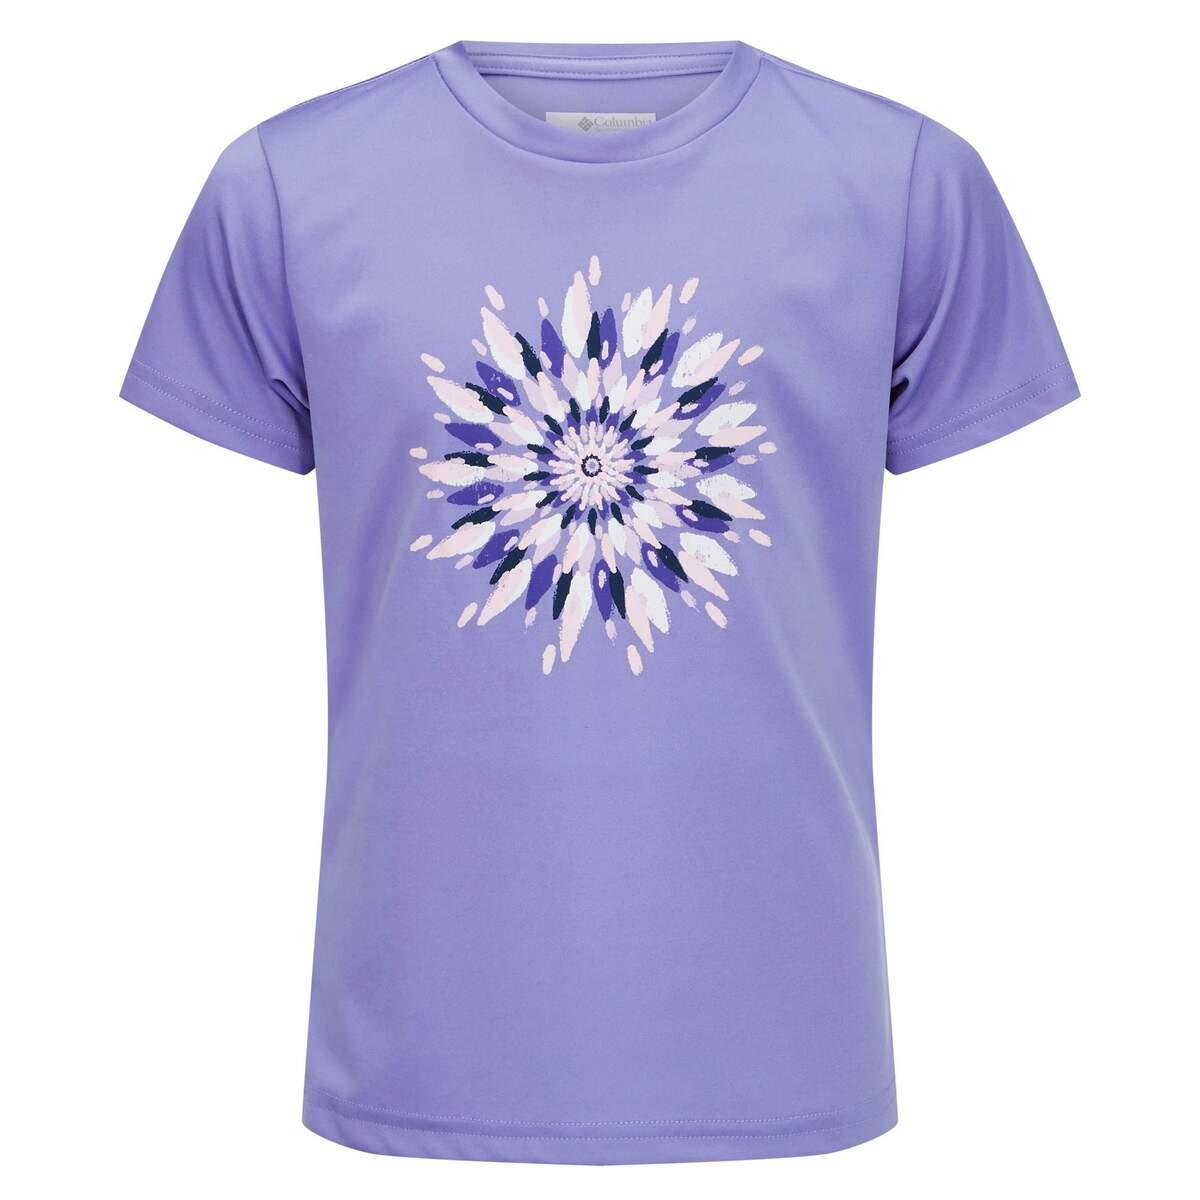 Bild 1 von Columbia TRAILTASTIC S/S SHIRT Kinder - T-Shirt